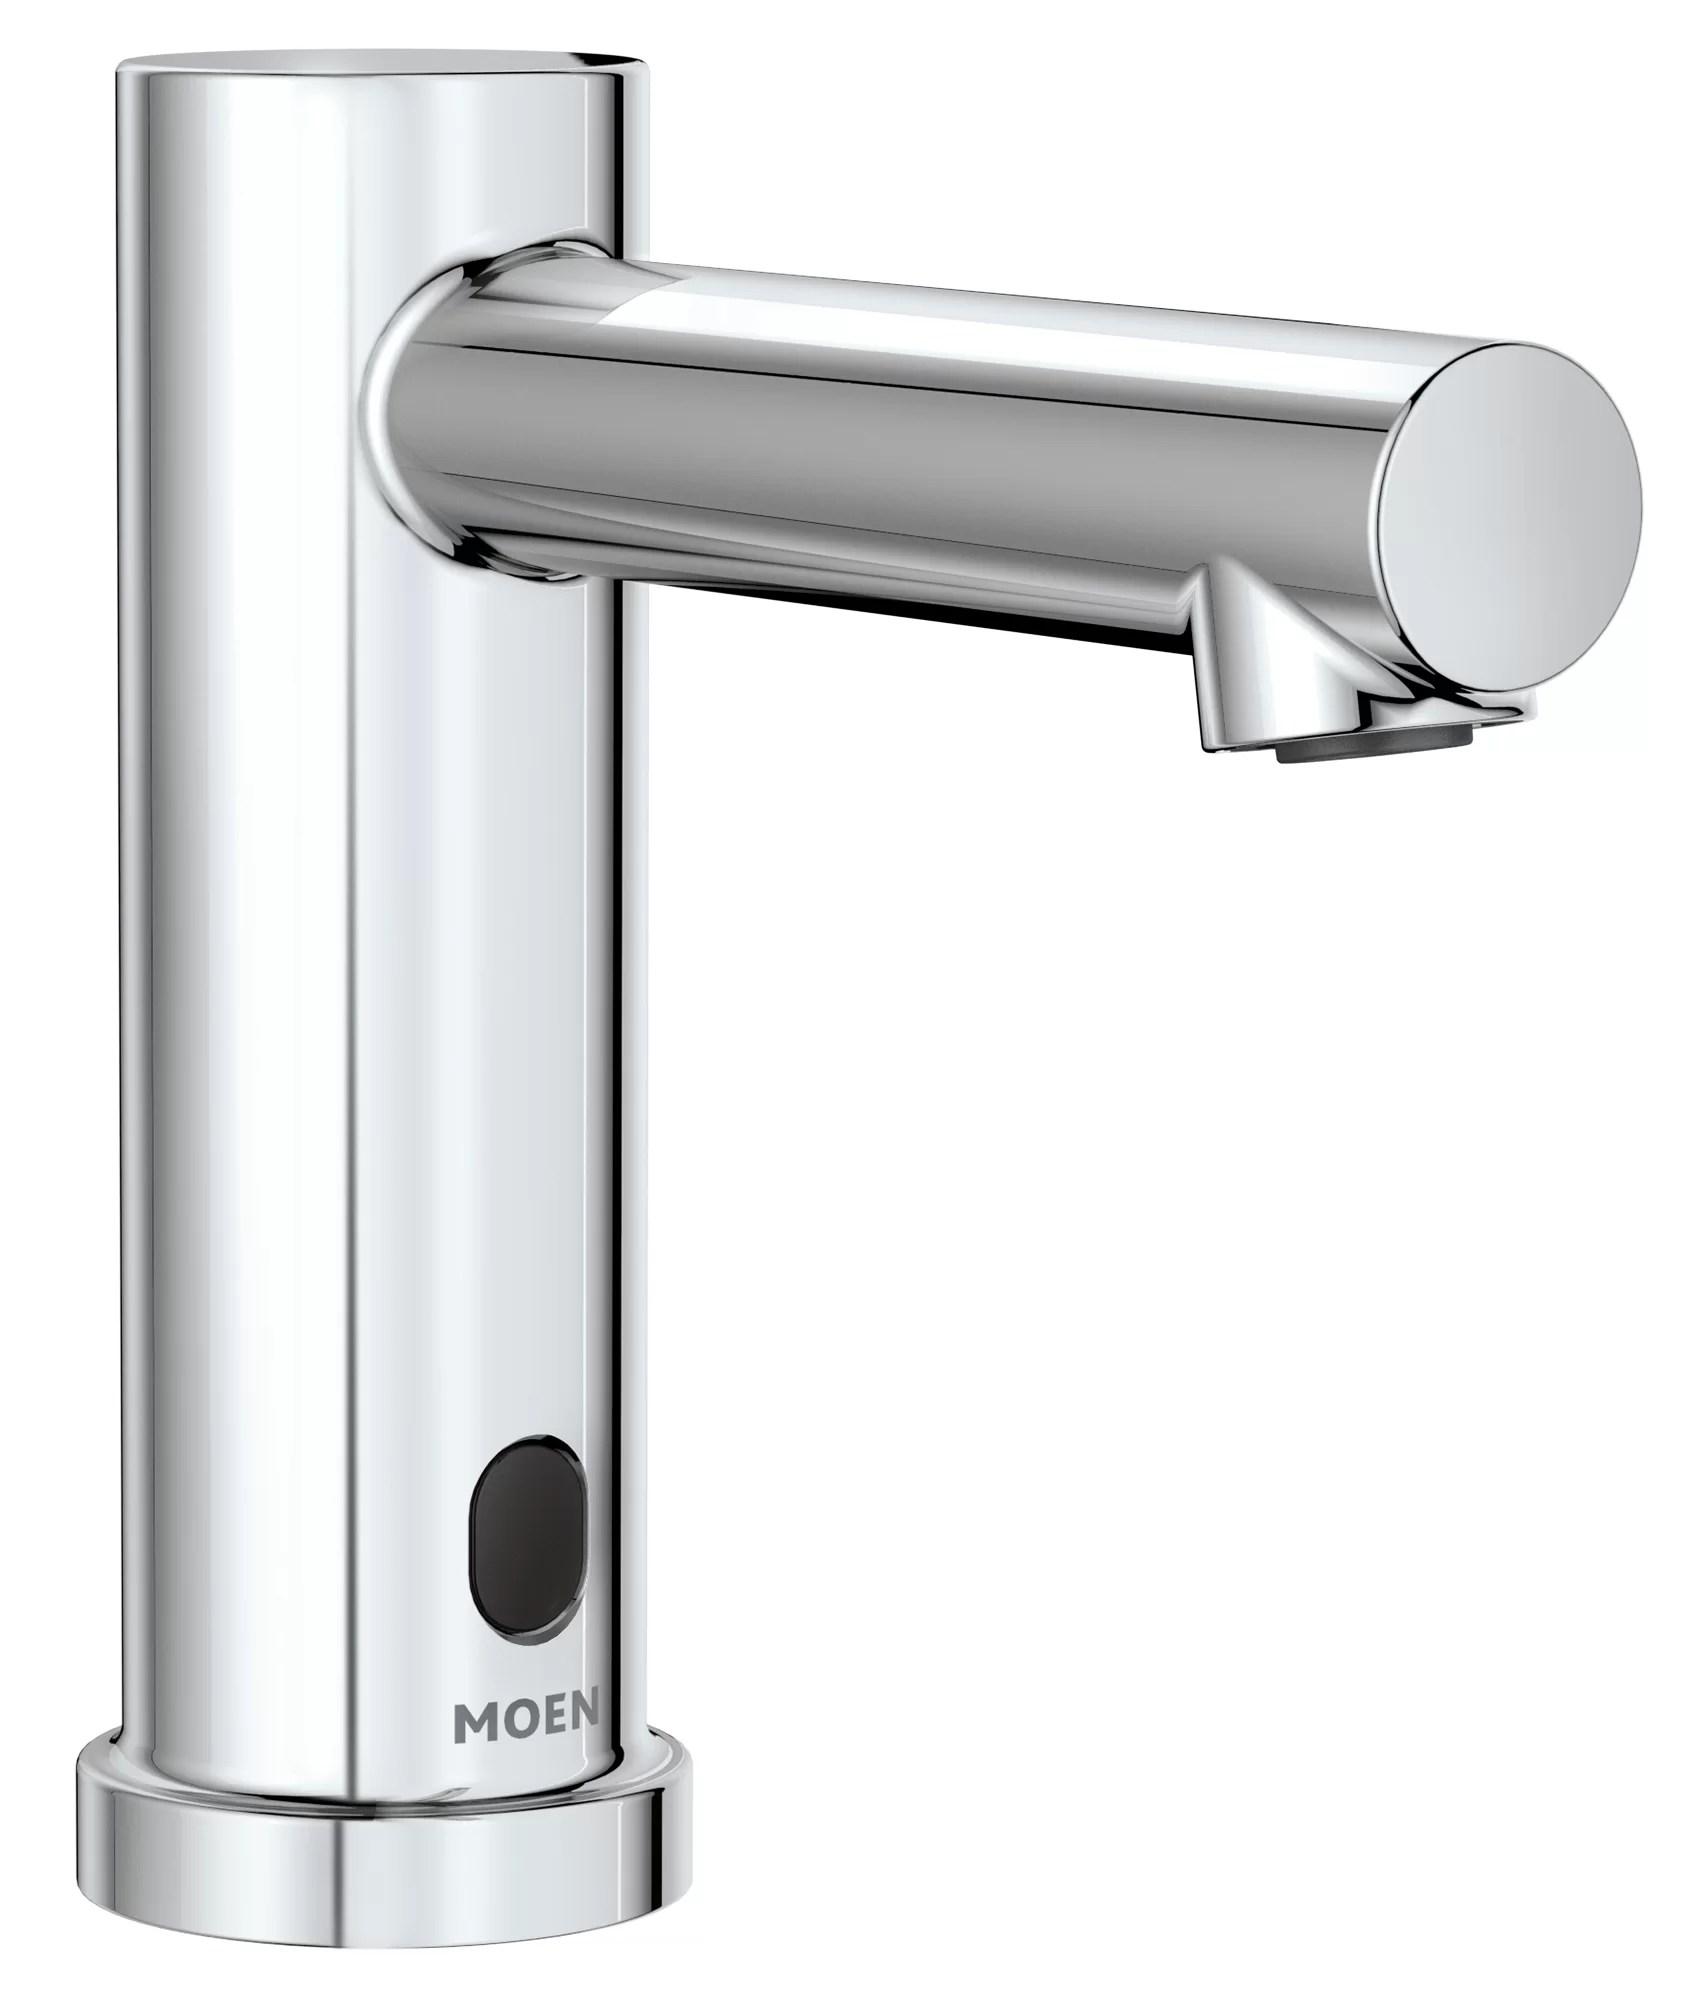 commercial m power single hole bathroom faucet